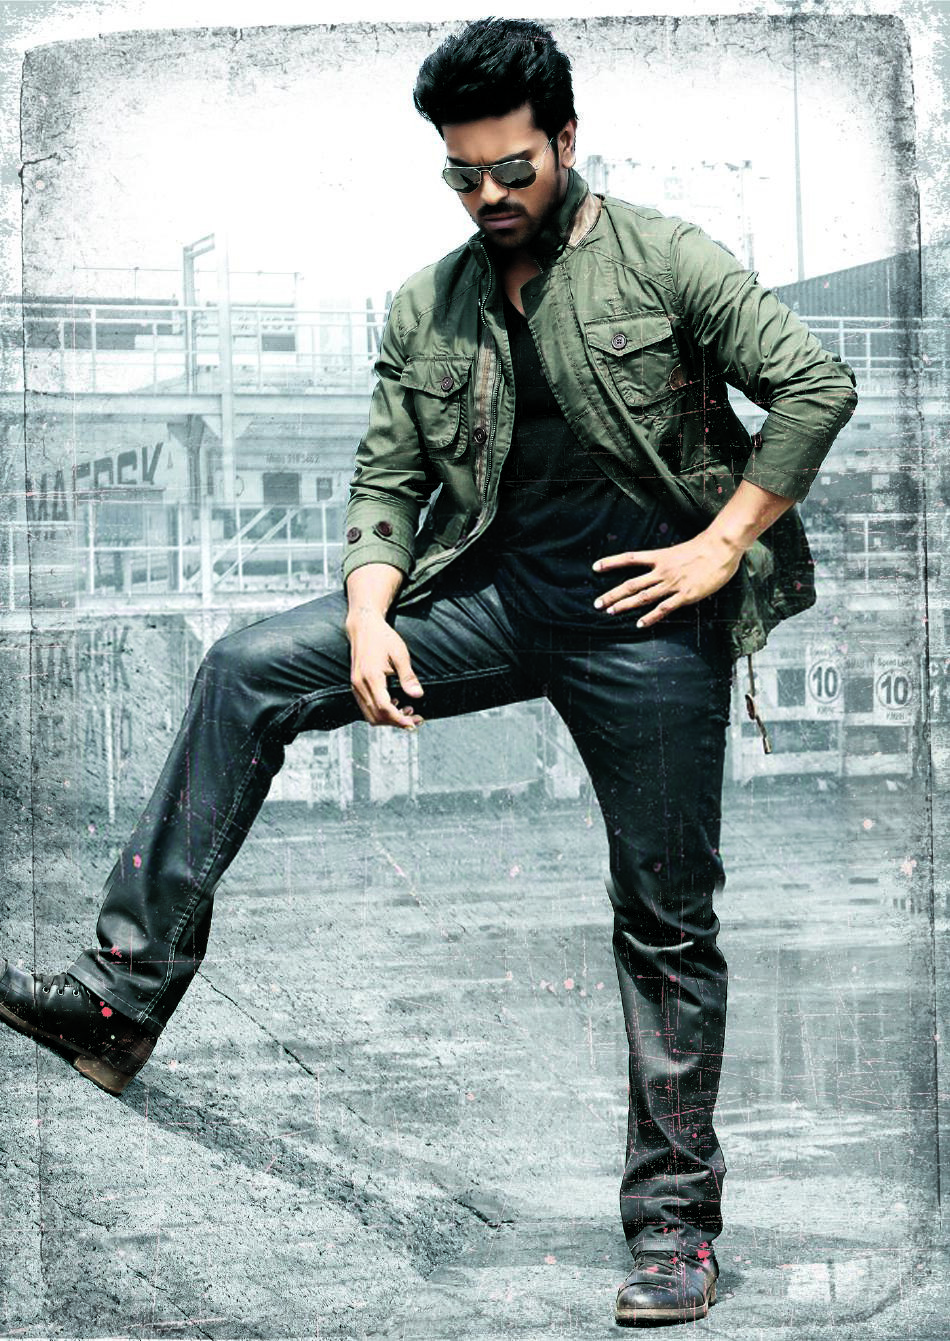 Ram Charan Yevadu Movie Stills 25cineframes